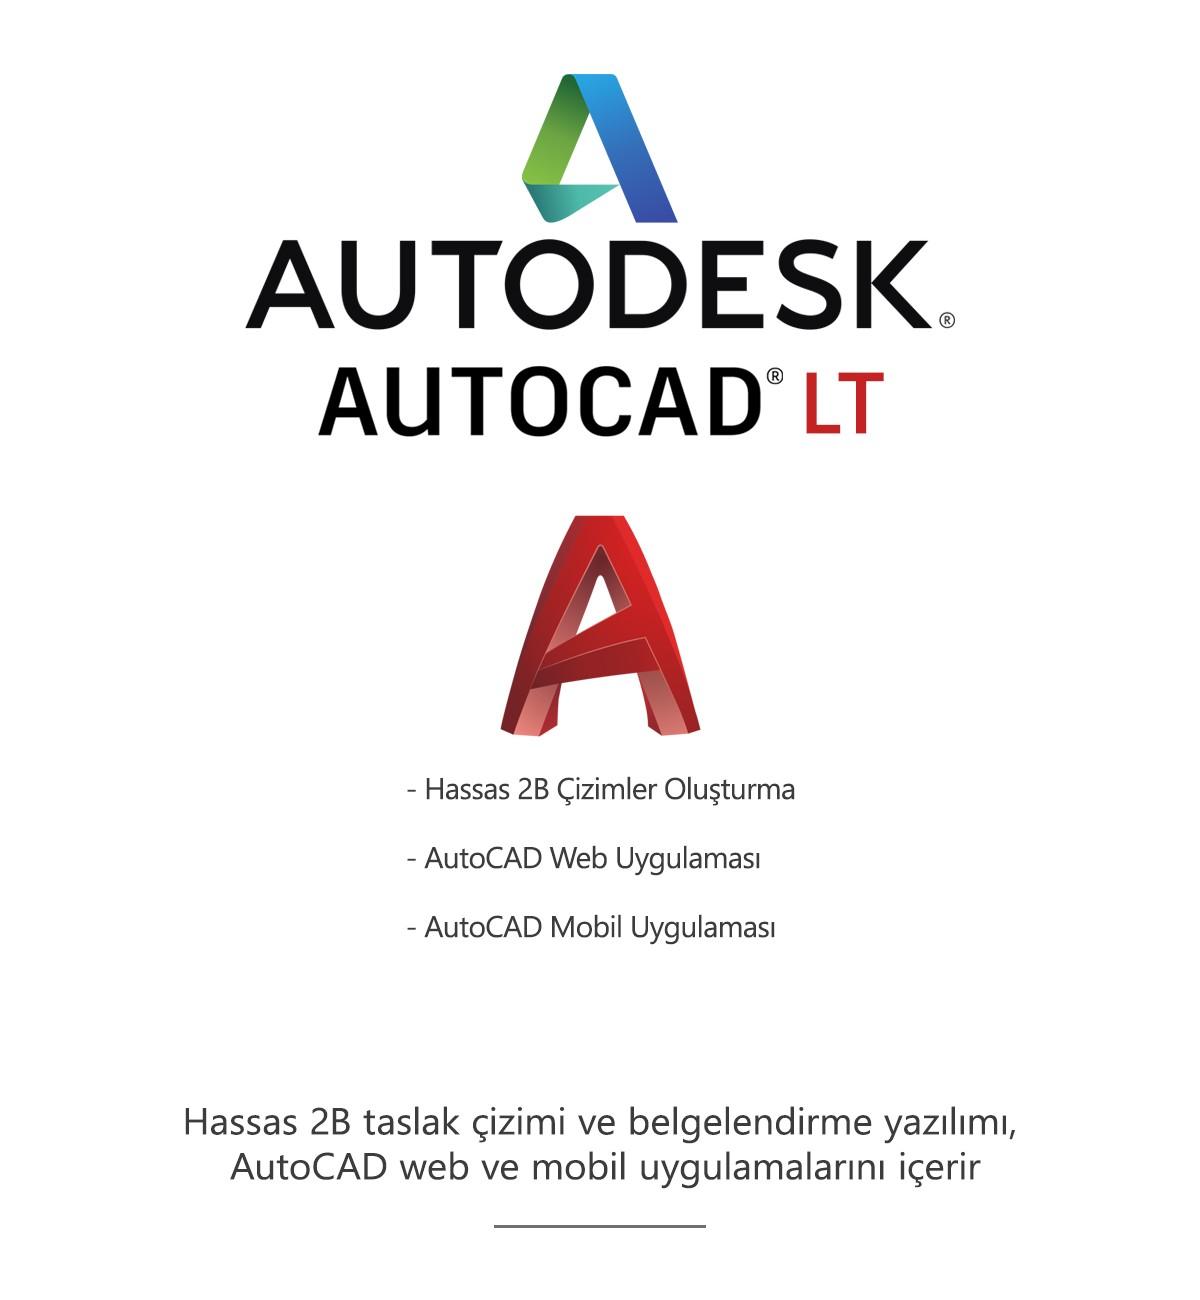 AutoCAD LT